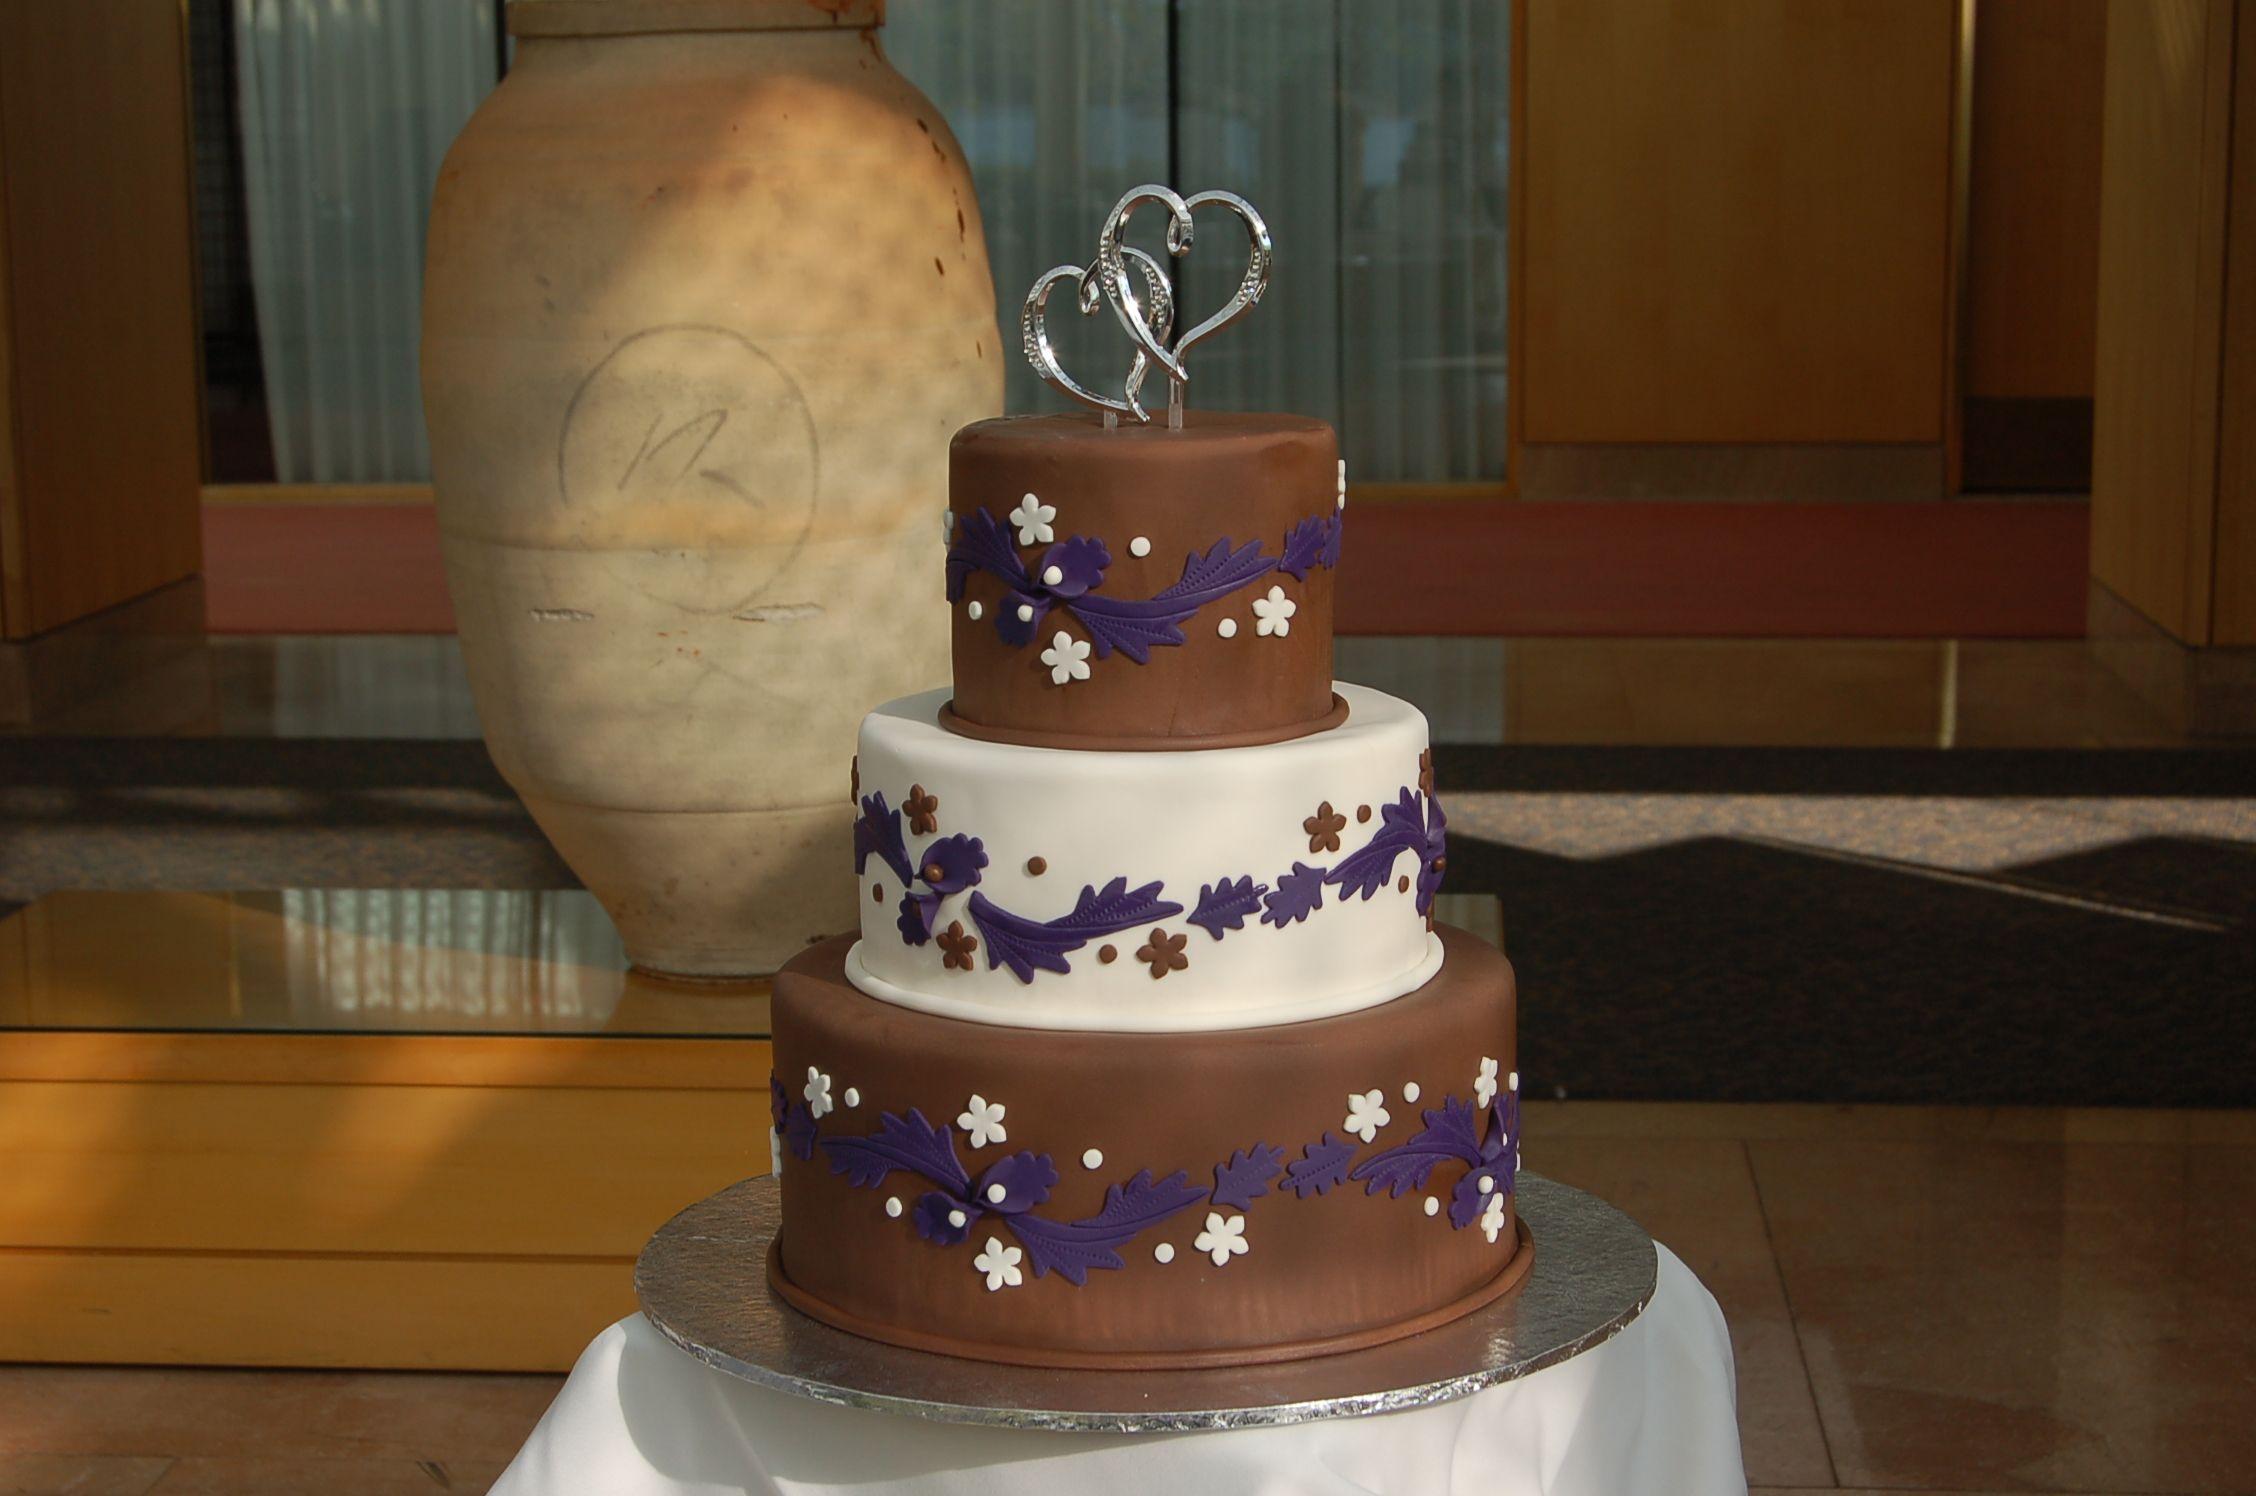 Brown & purple three tier wedding cake